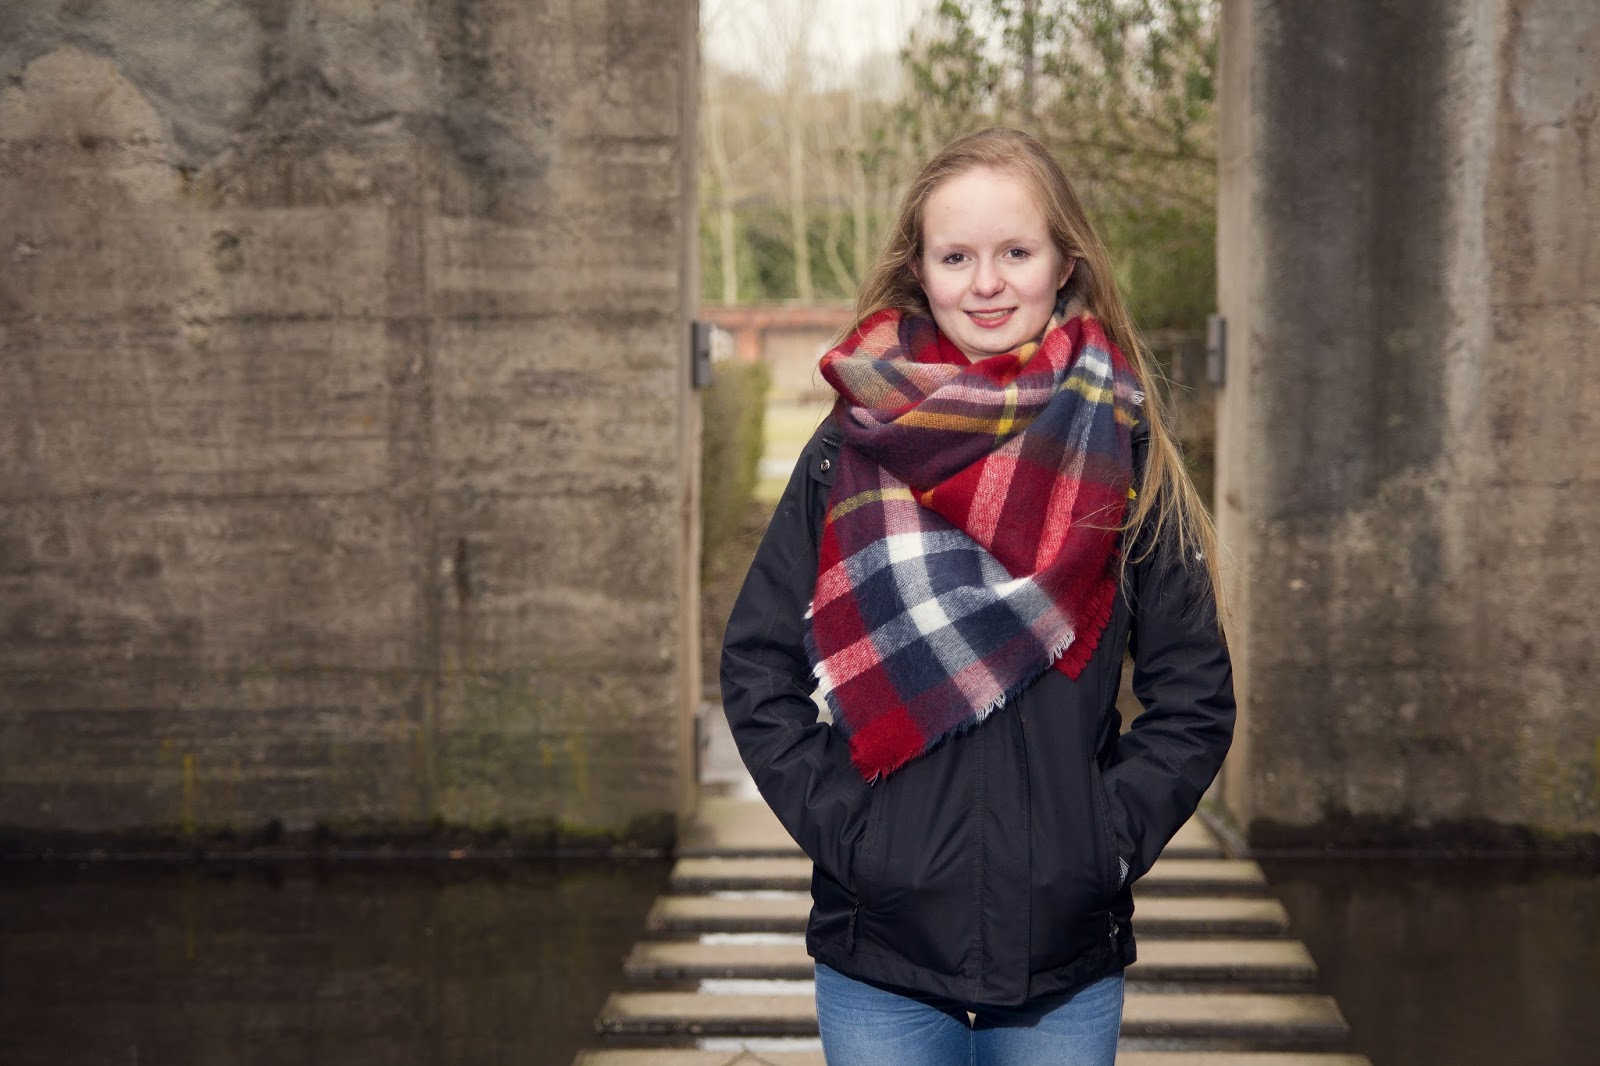 Portrait von Lisa Teil 5 - Portraitfotografie Andreas Blauth